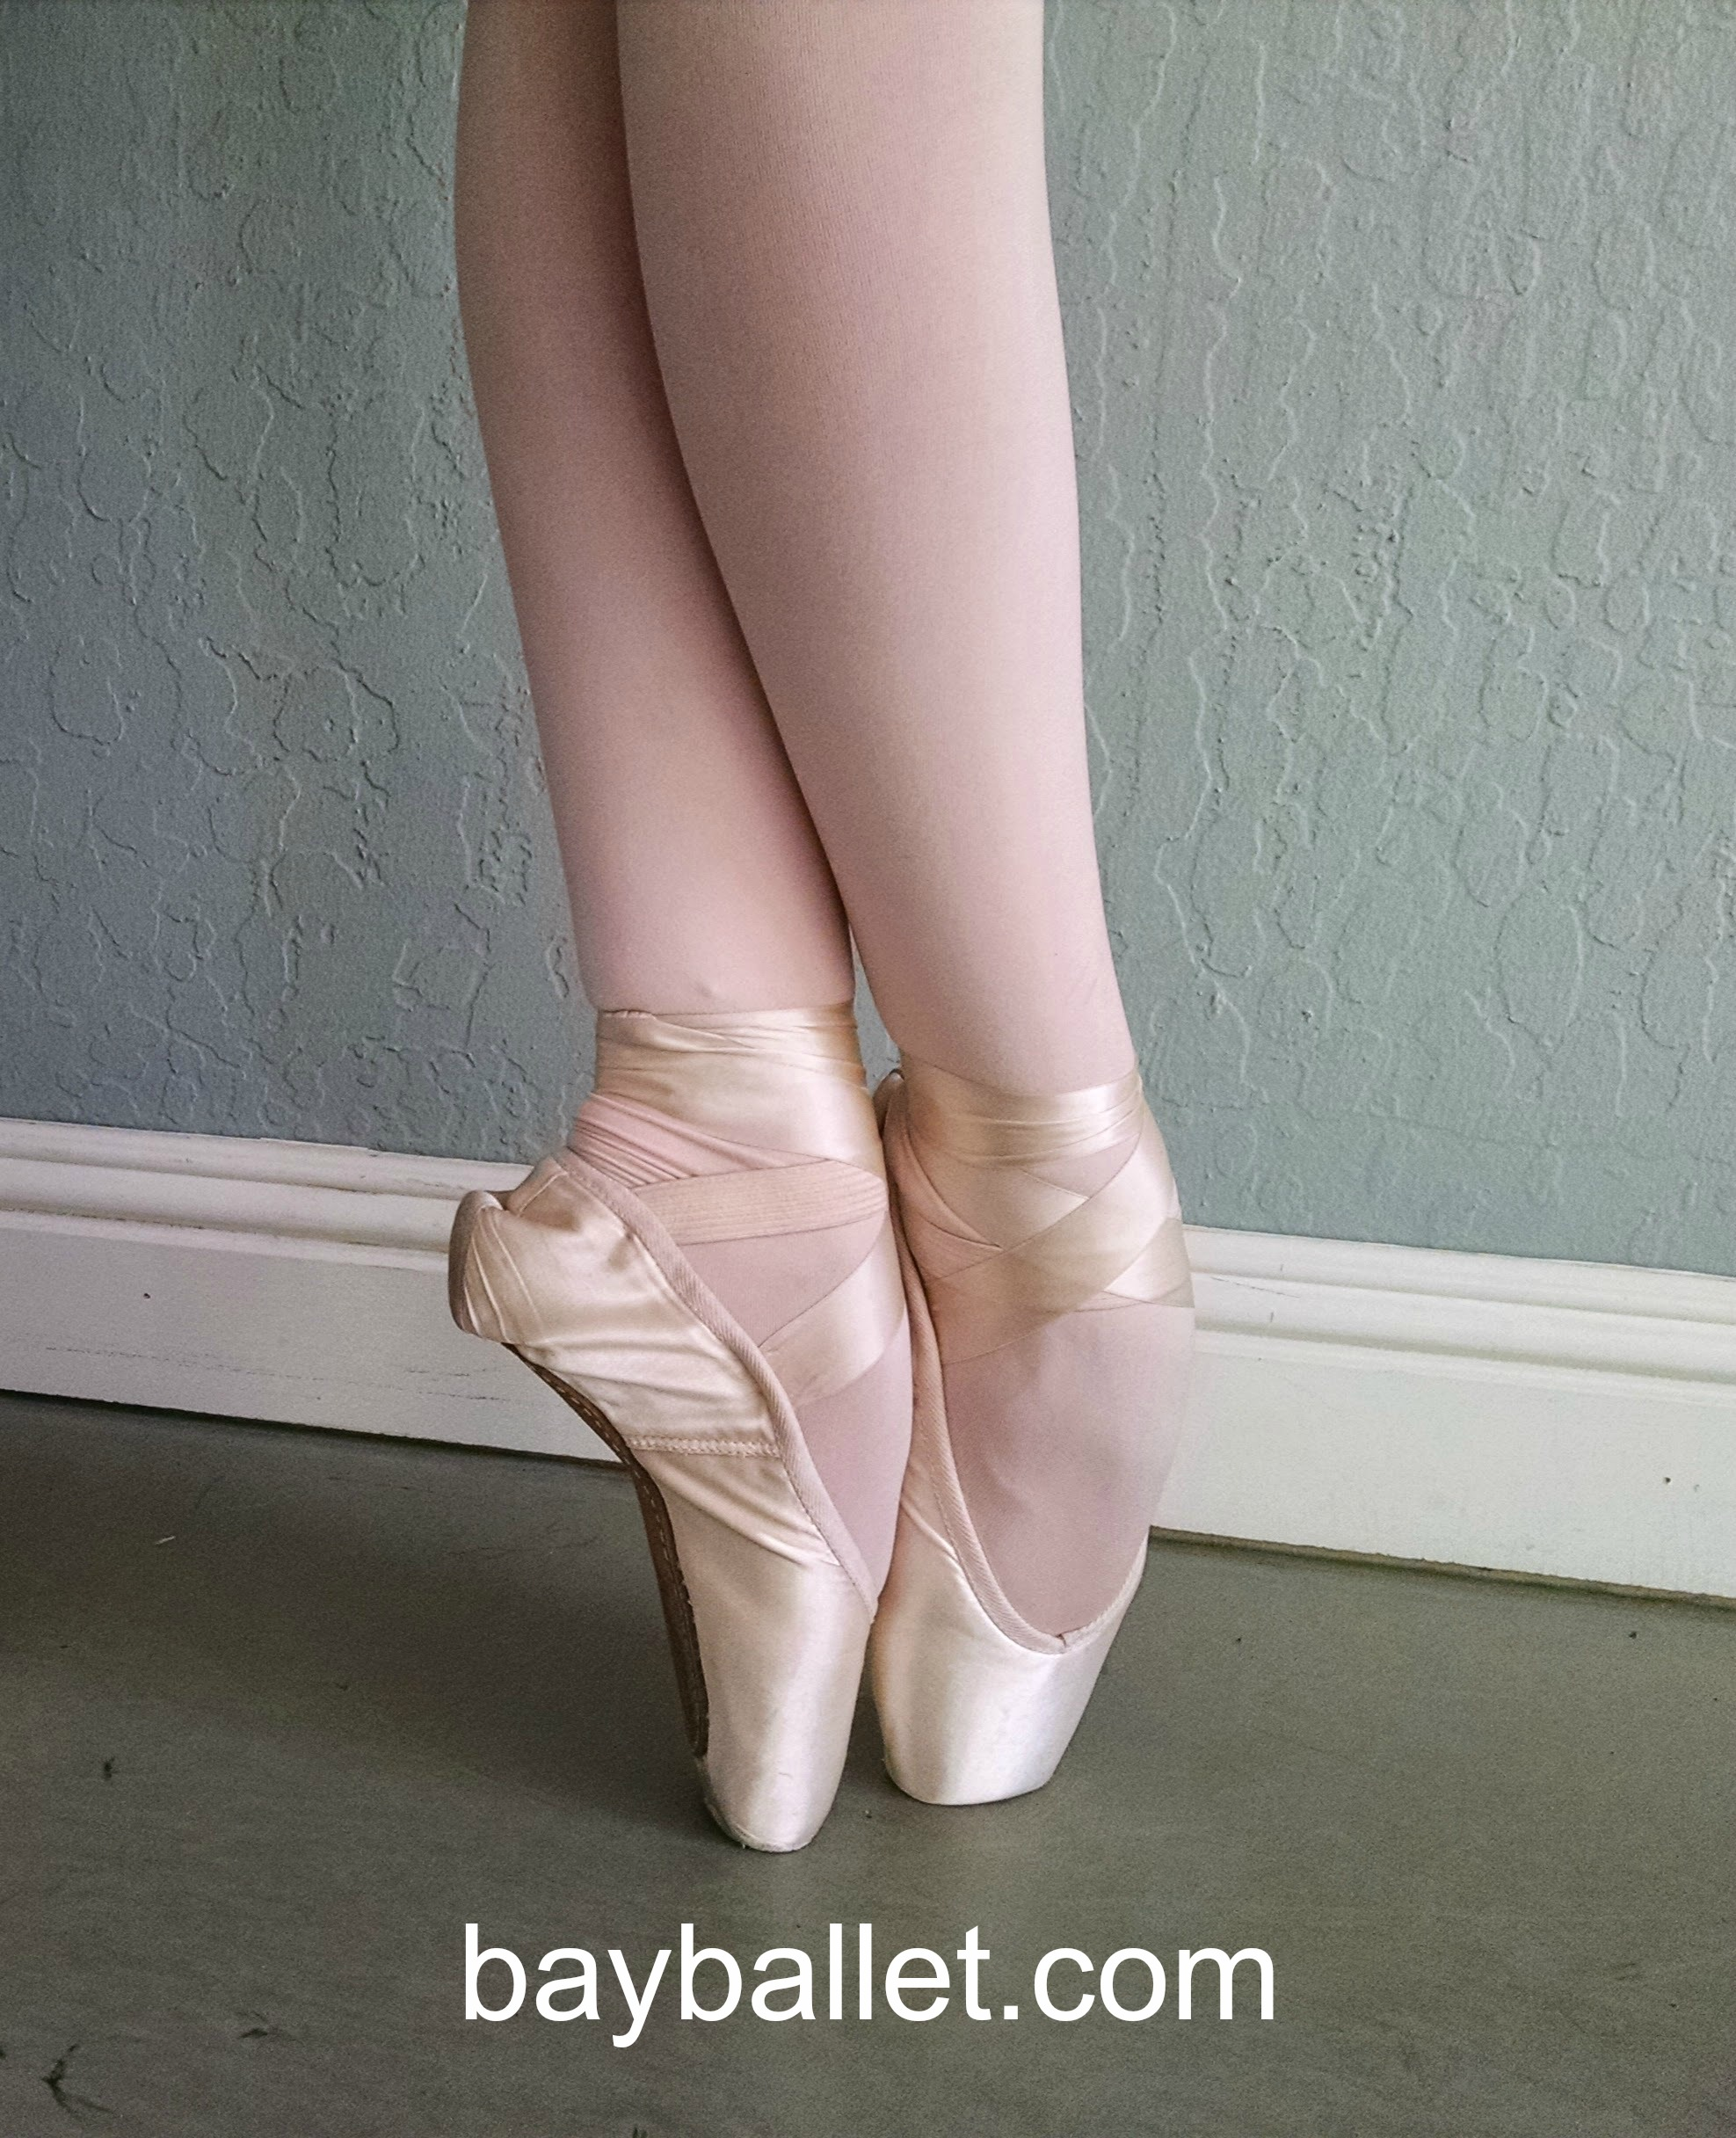 Bay_Ballet_Academy_San_Jose_Willow_Glen_Maximo_Califano_Dance_Classes_Jazz_Lyrical_Hip_Hop_Modern_Neoclassical_Class_12